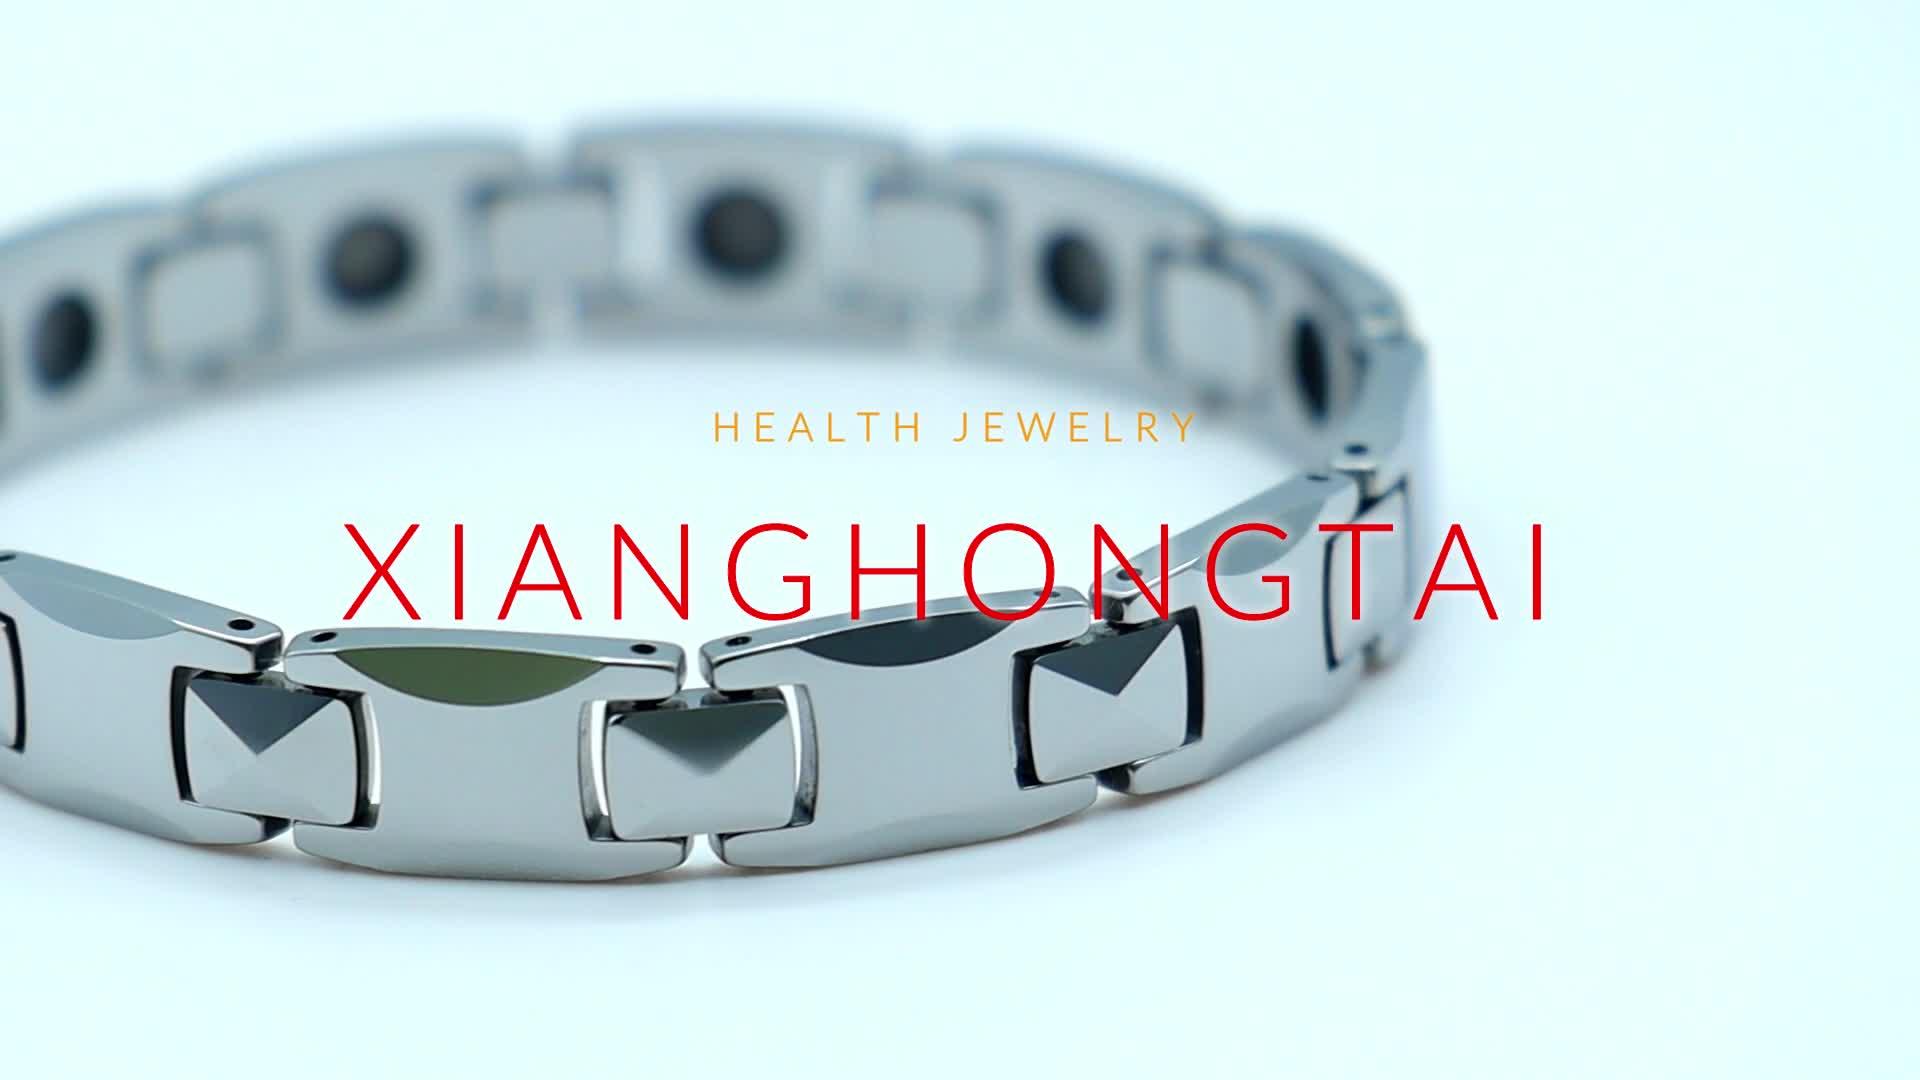 Power Energy Silver Gold Plated Hematite Ceramic Bio Energy Tungsten Bracelet